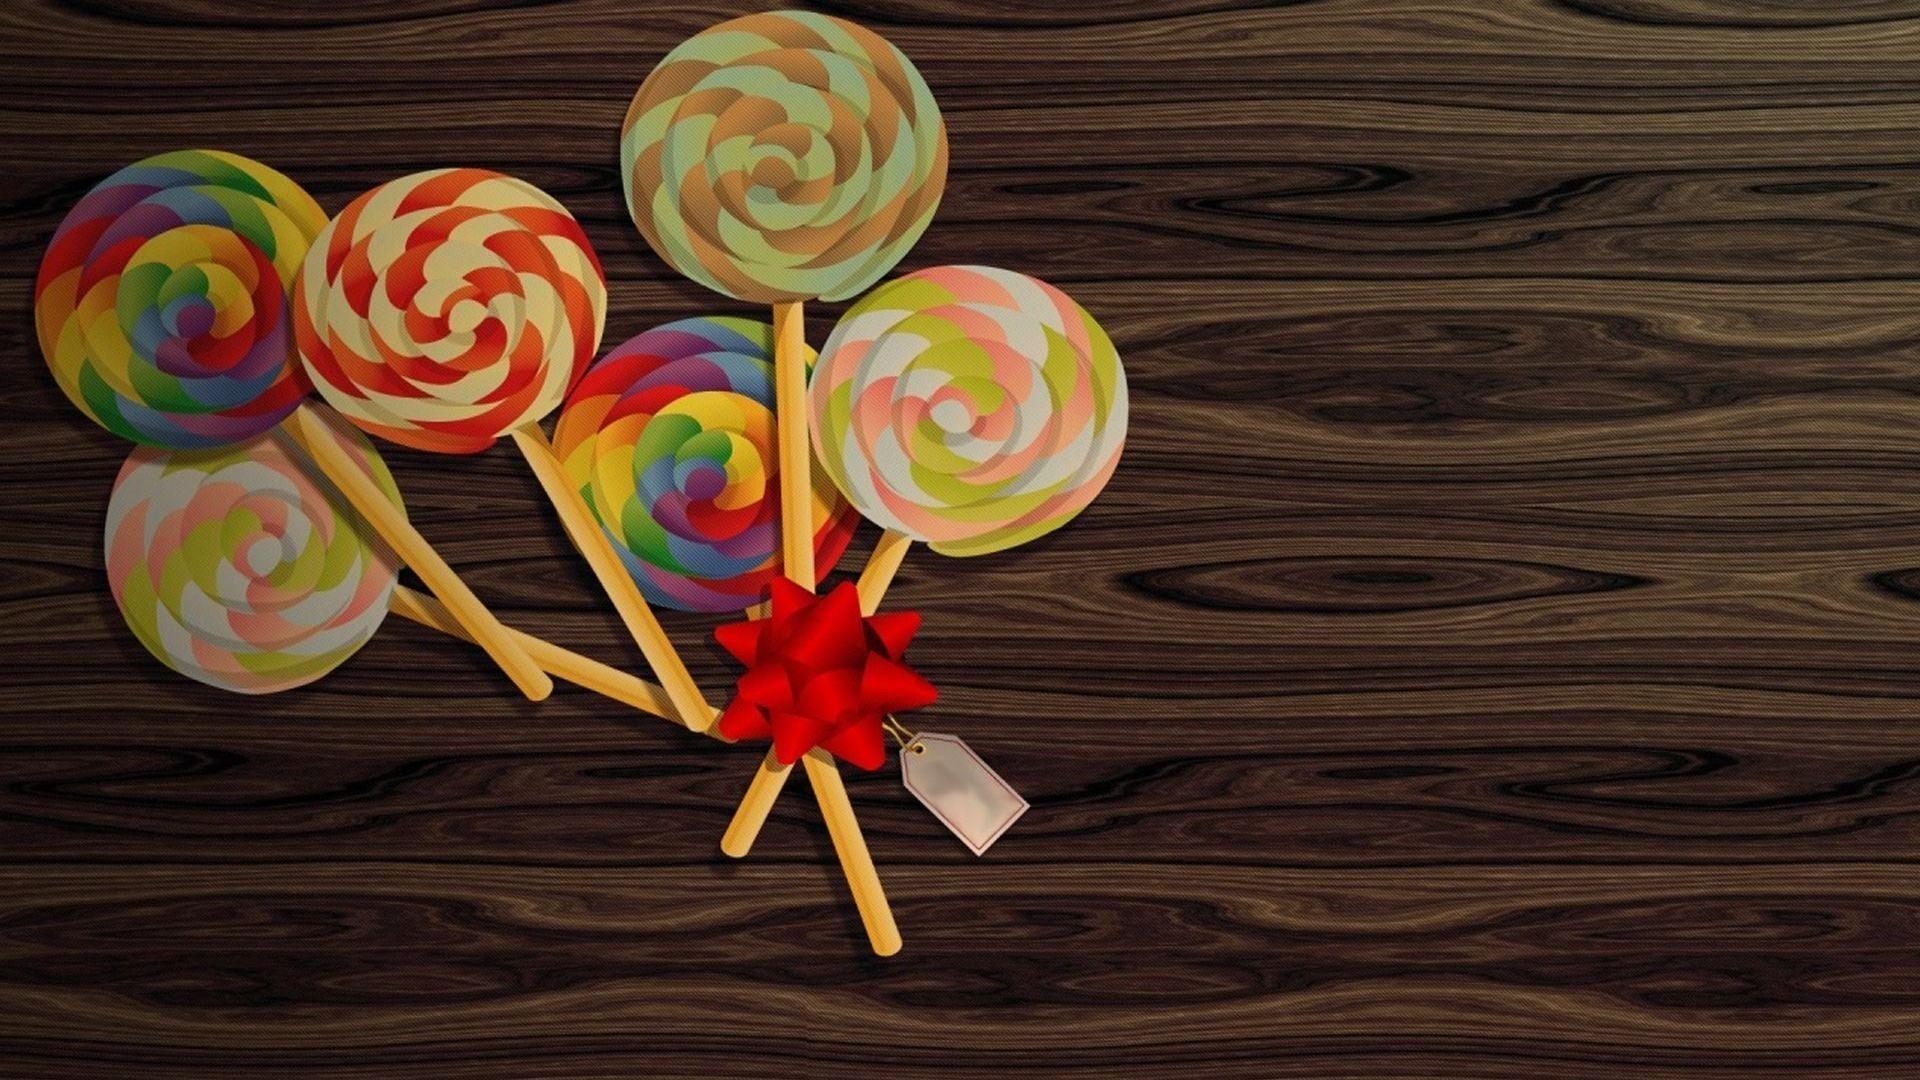 Lollipop Wallpaper Cute Lolipop Wallpapers Wallpaper Cave